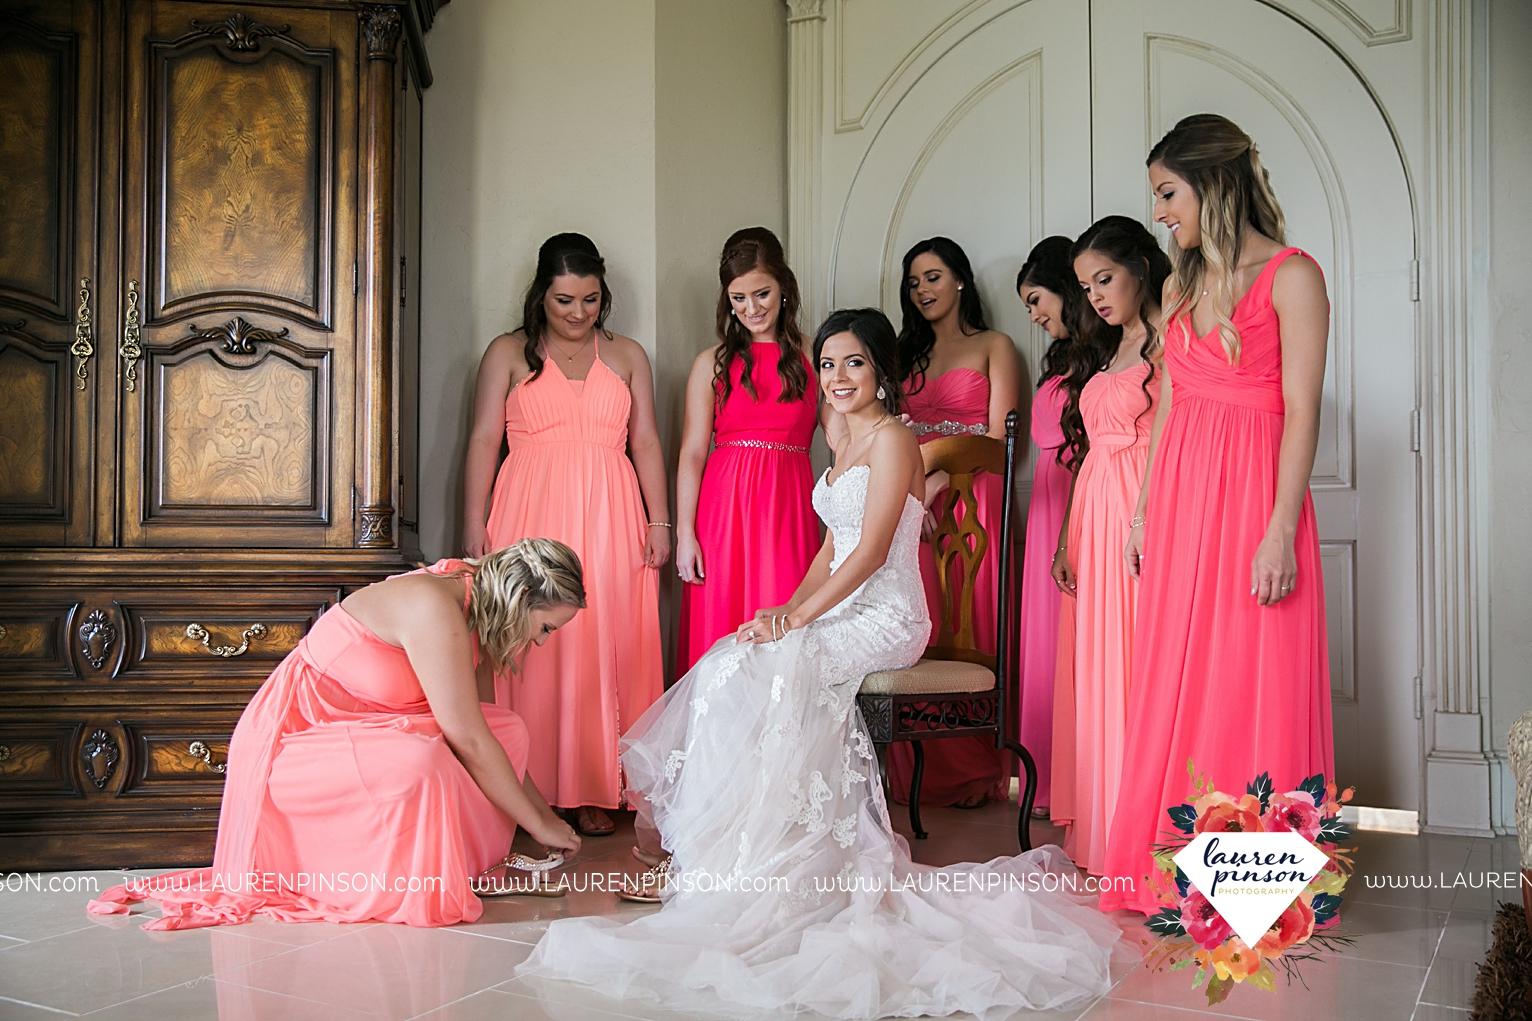 wichita-falls-wedding-nocona-comanche-rose-ranch-rustic-pink-gray-photography-00108.jpg